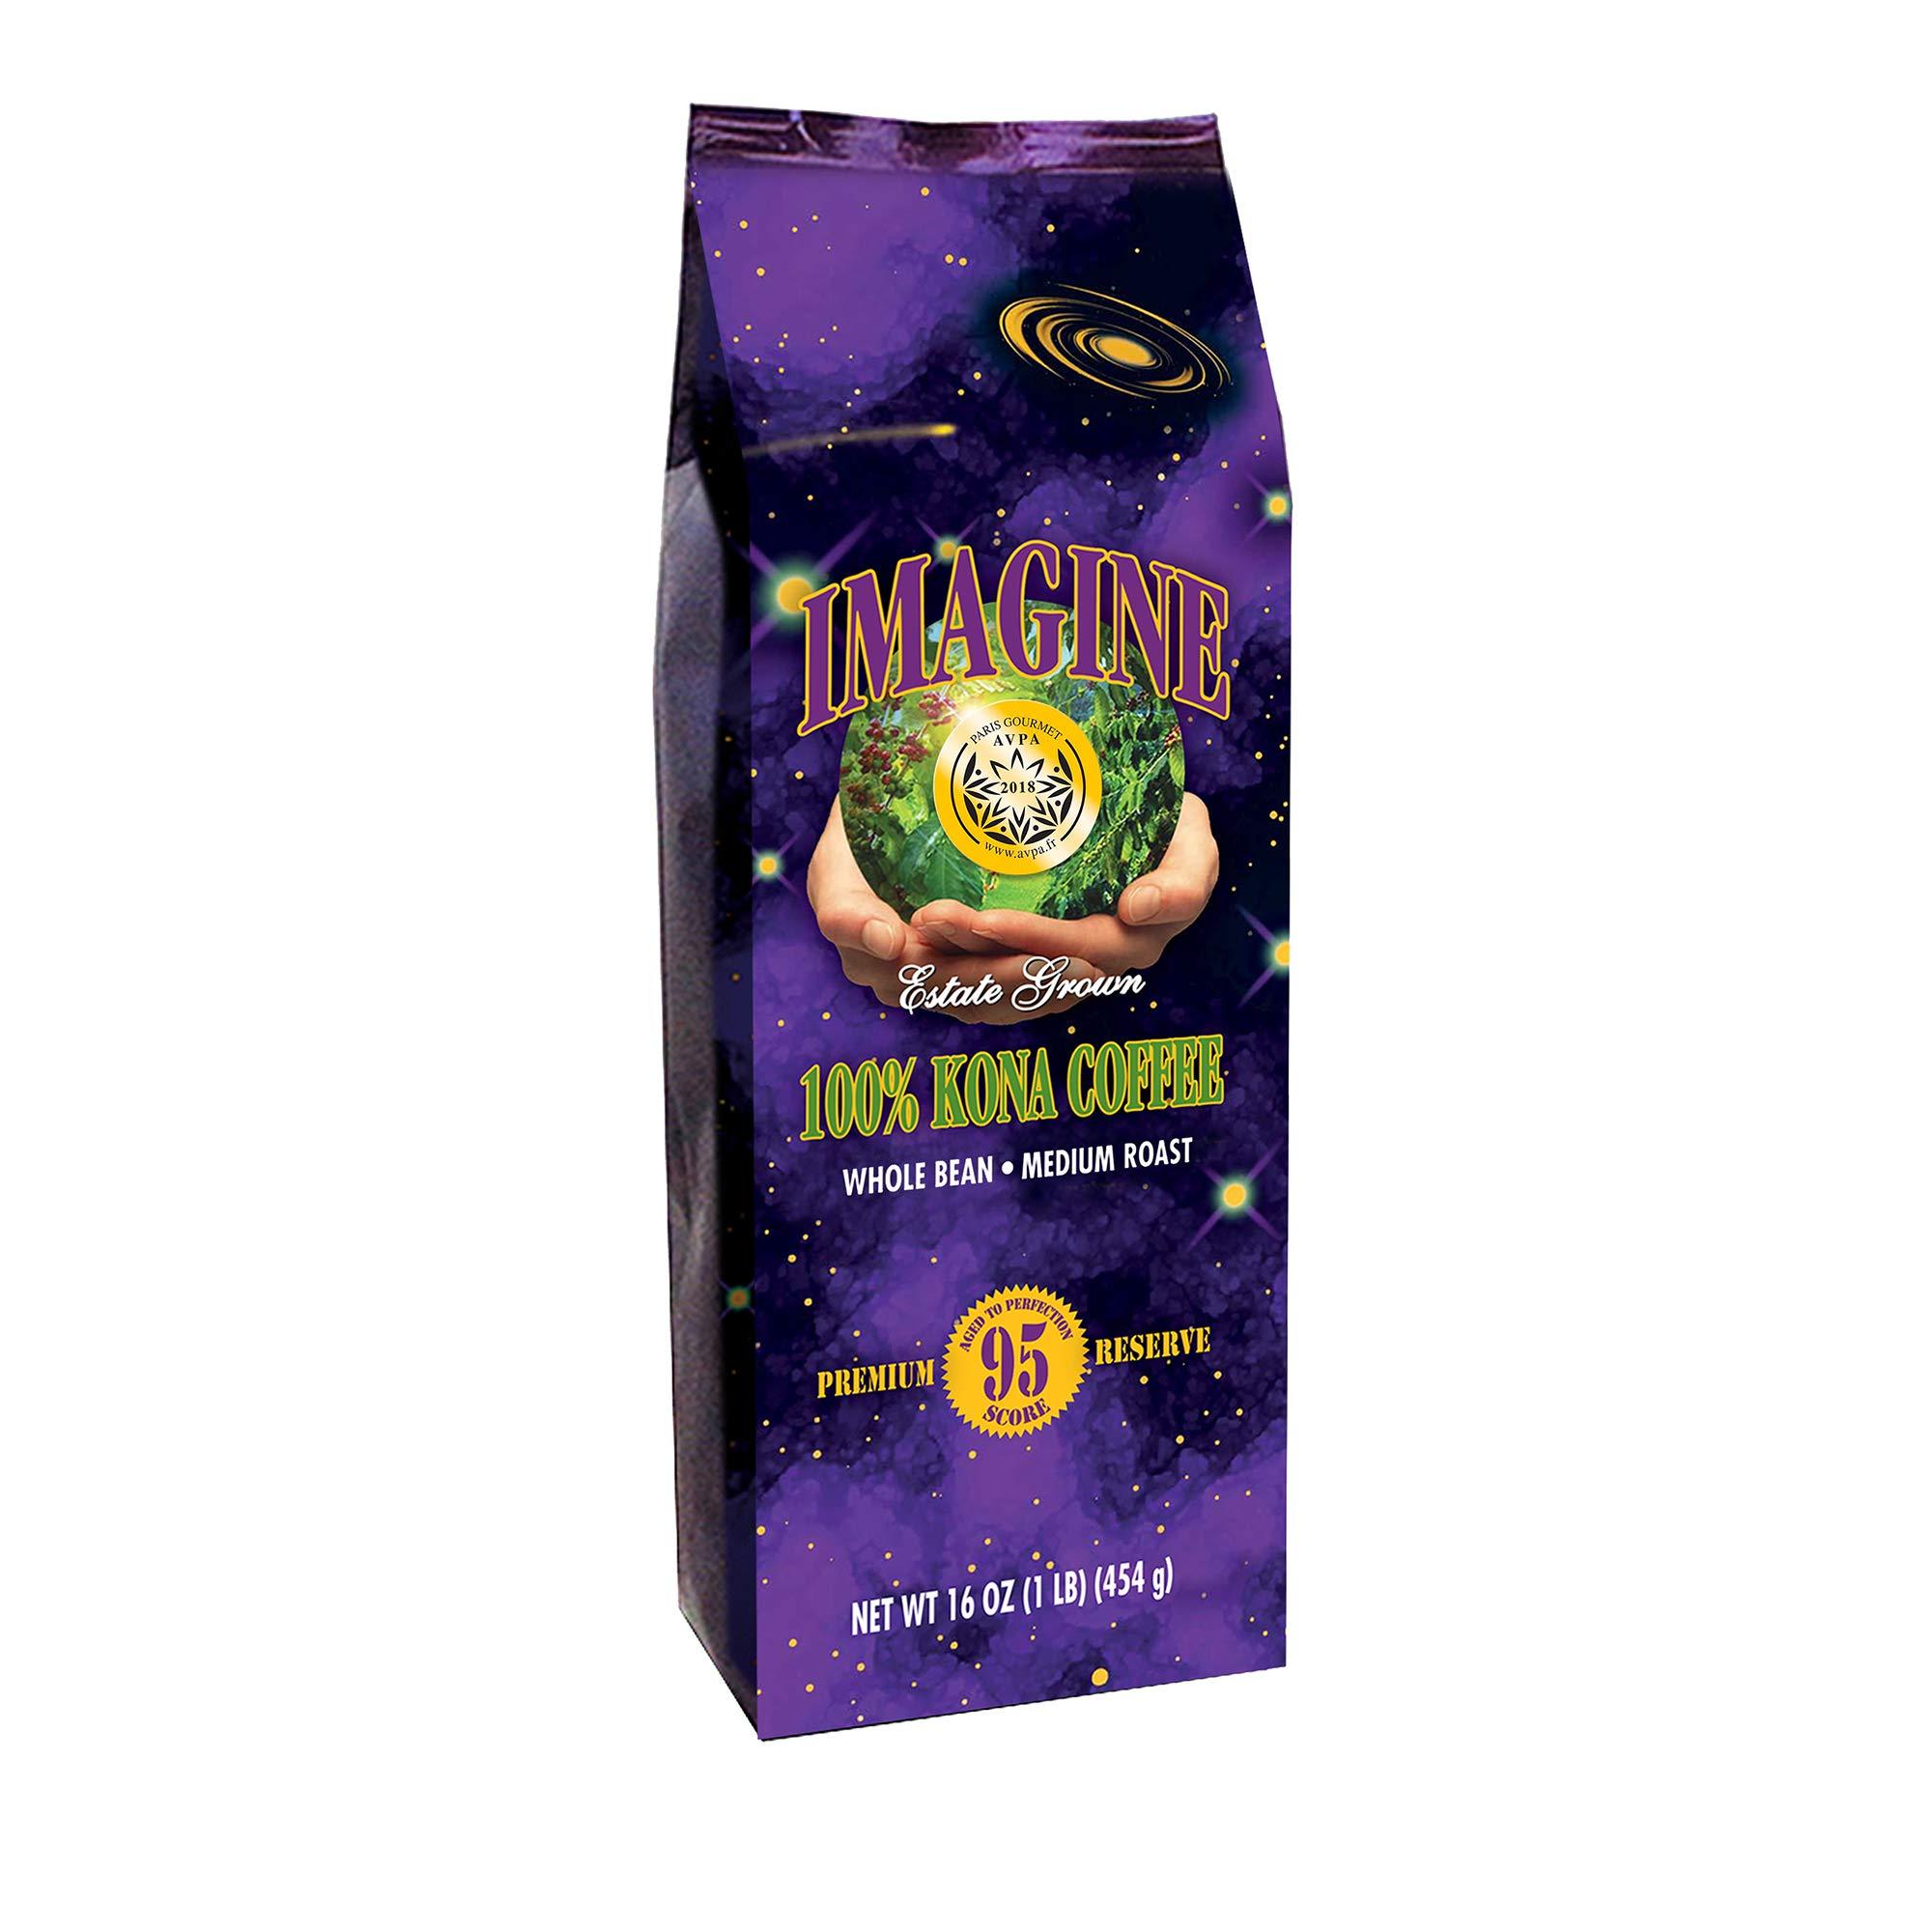 Kona Coffee Beans by Imagine - 100% Kona Hawaii - Medium Dark Roast Whole Bean - 16 oz Bag by Imagine